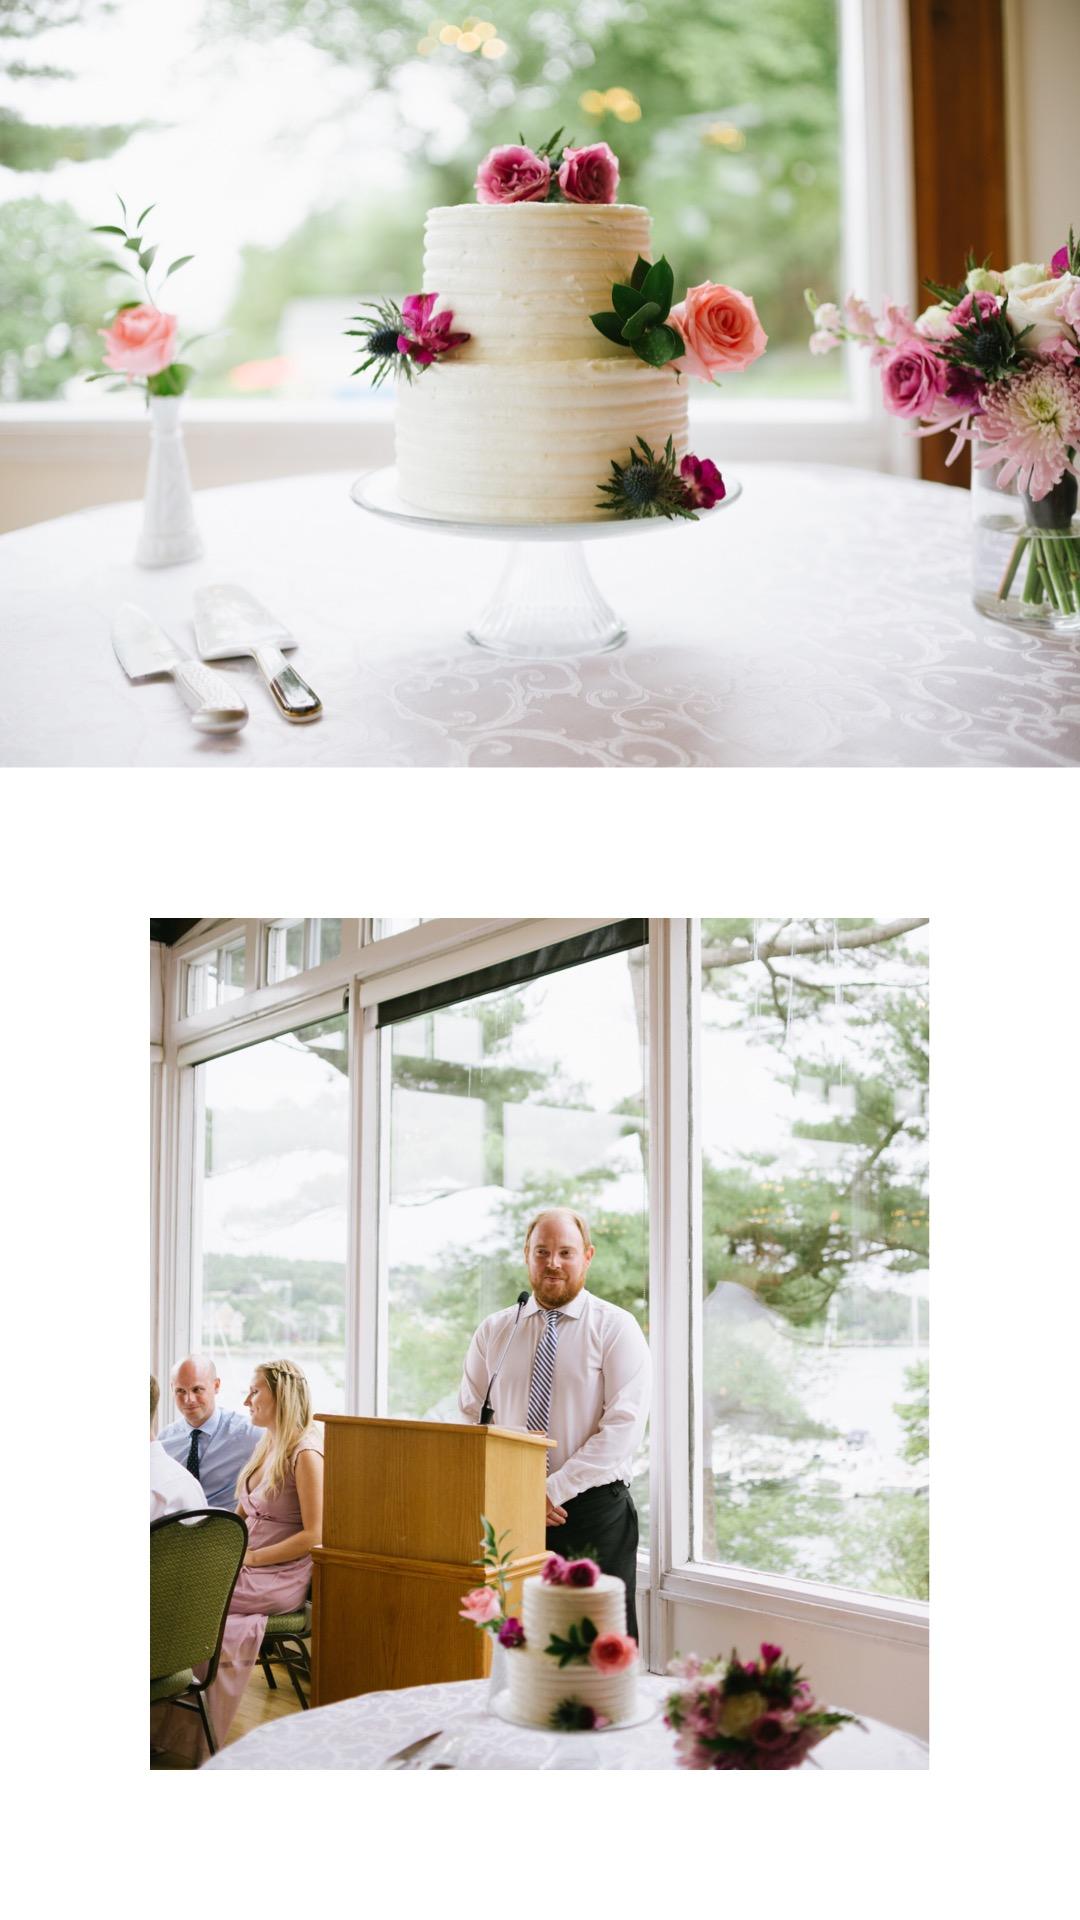 Martina & Scott Halifax Wedding Photographer - Sinead Dubeau Photography 25